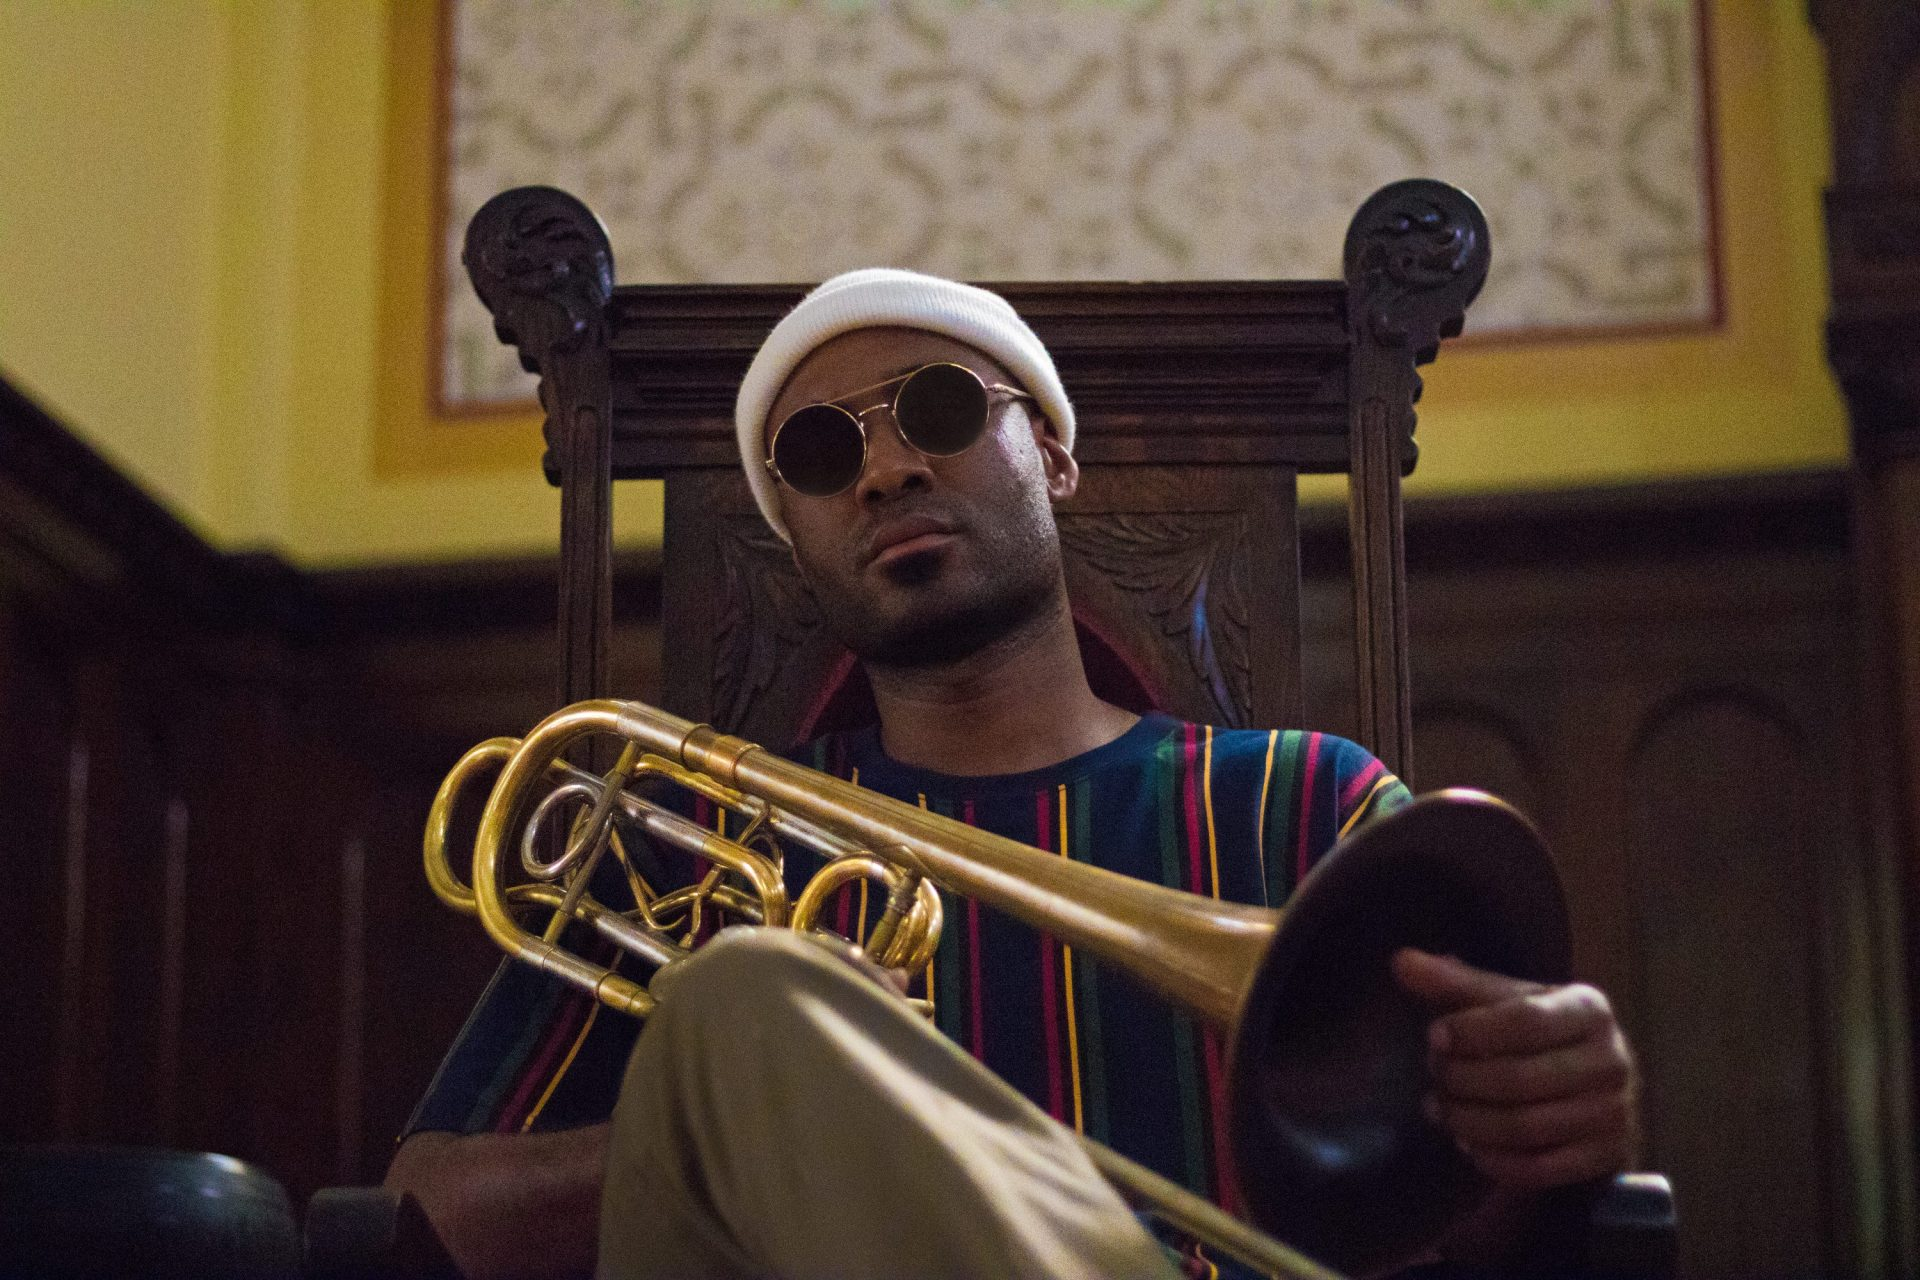 Twistedsoul - Reginald Chapman set to drop new LP via Fresh Selects